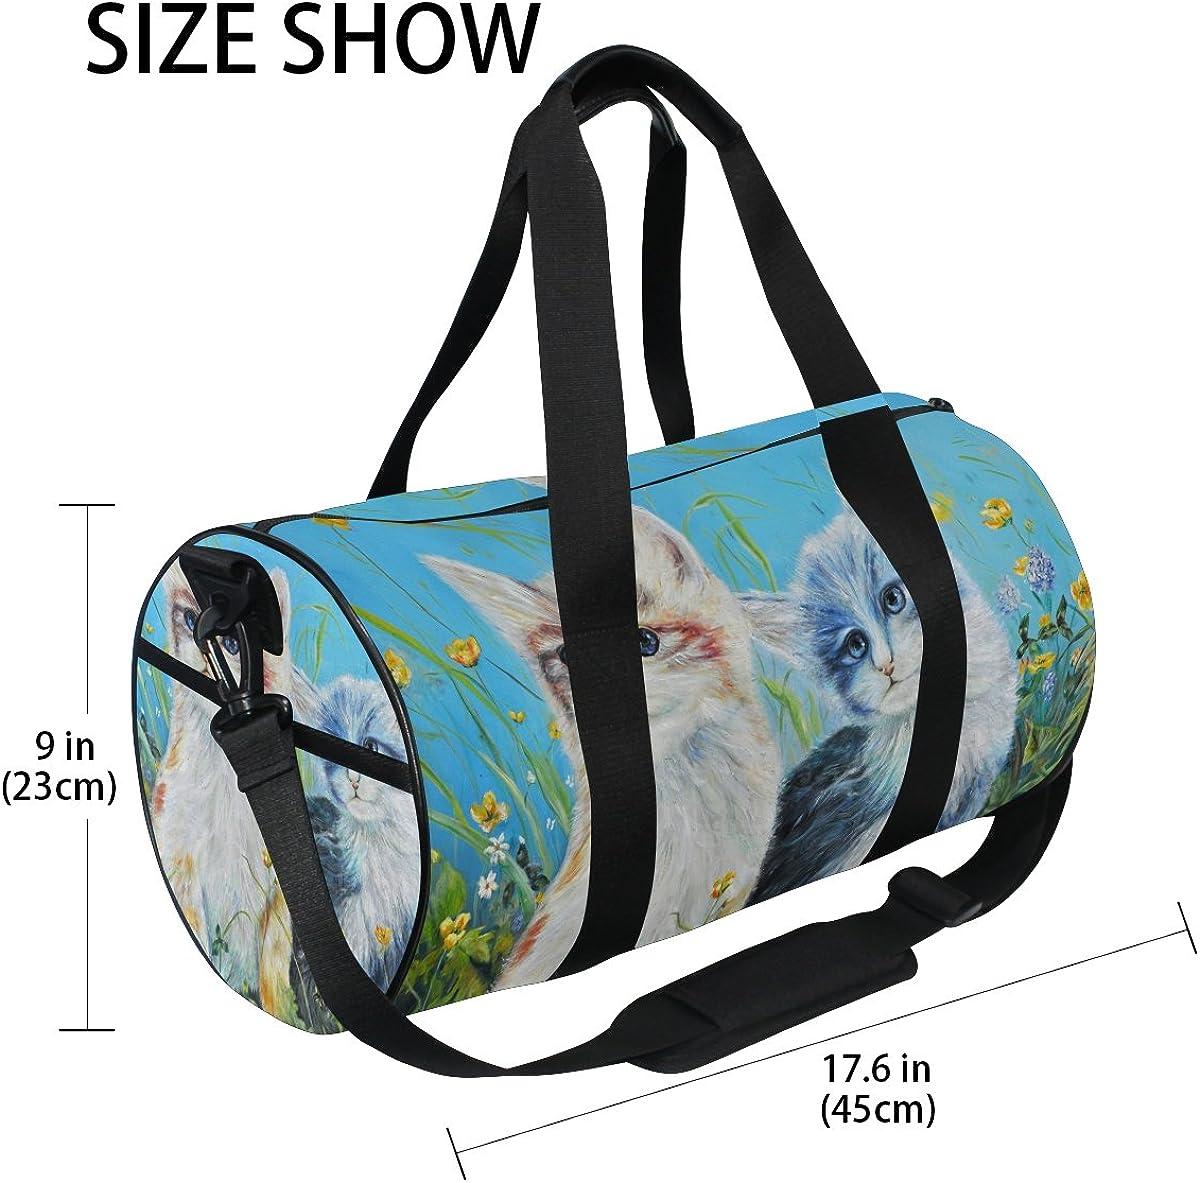 Evolutions Cute Cats Travel Duffel Bag Sports Gym Bag For Men /& Women